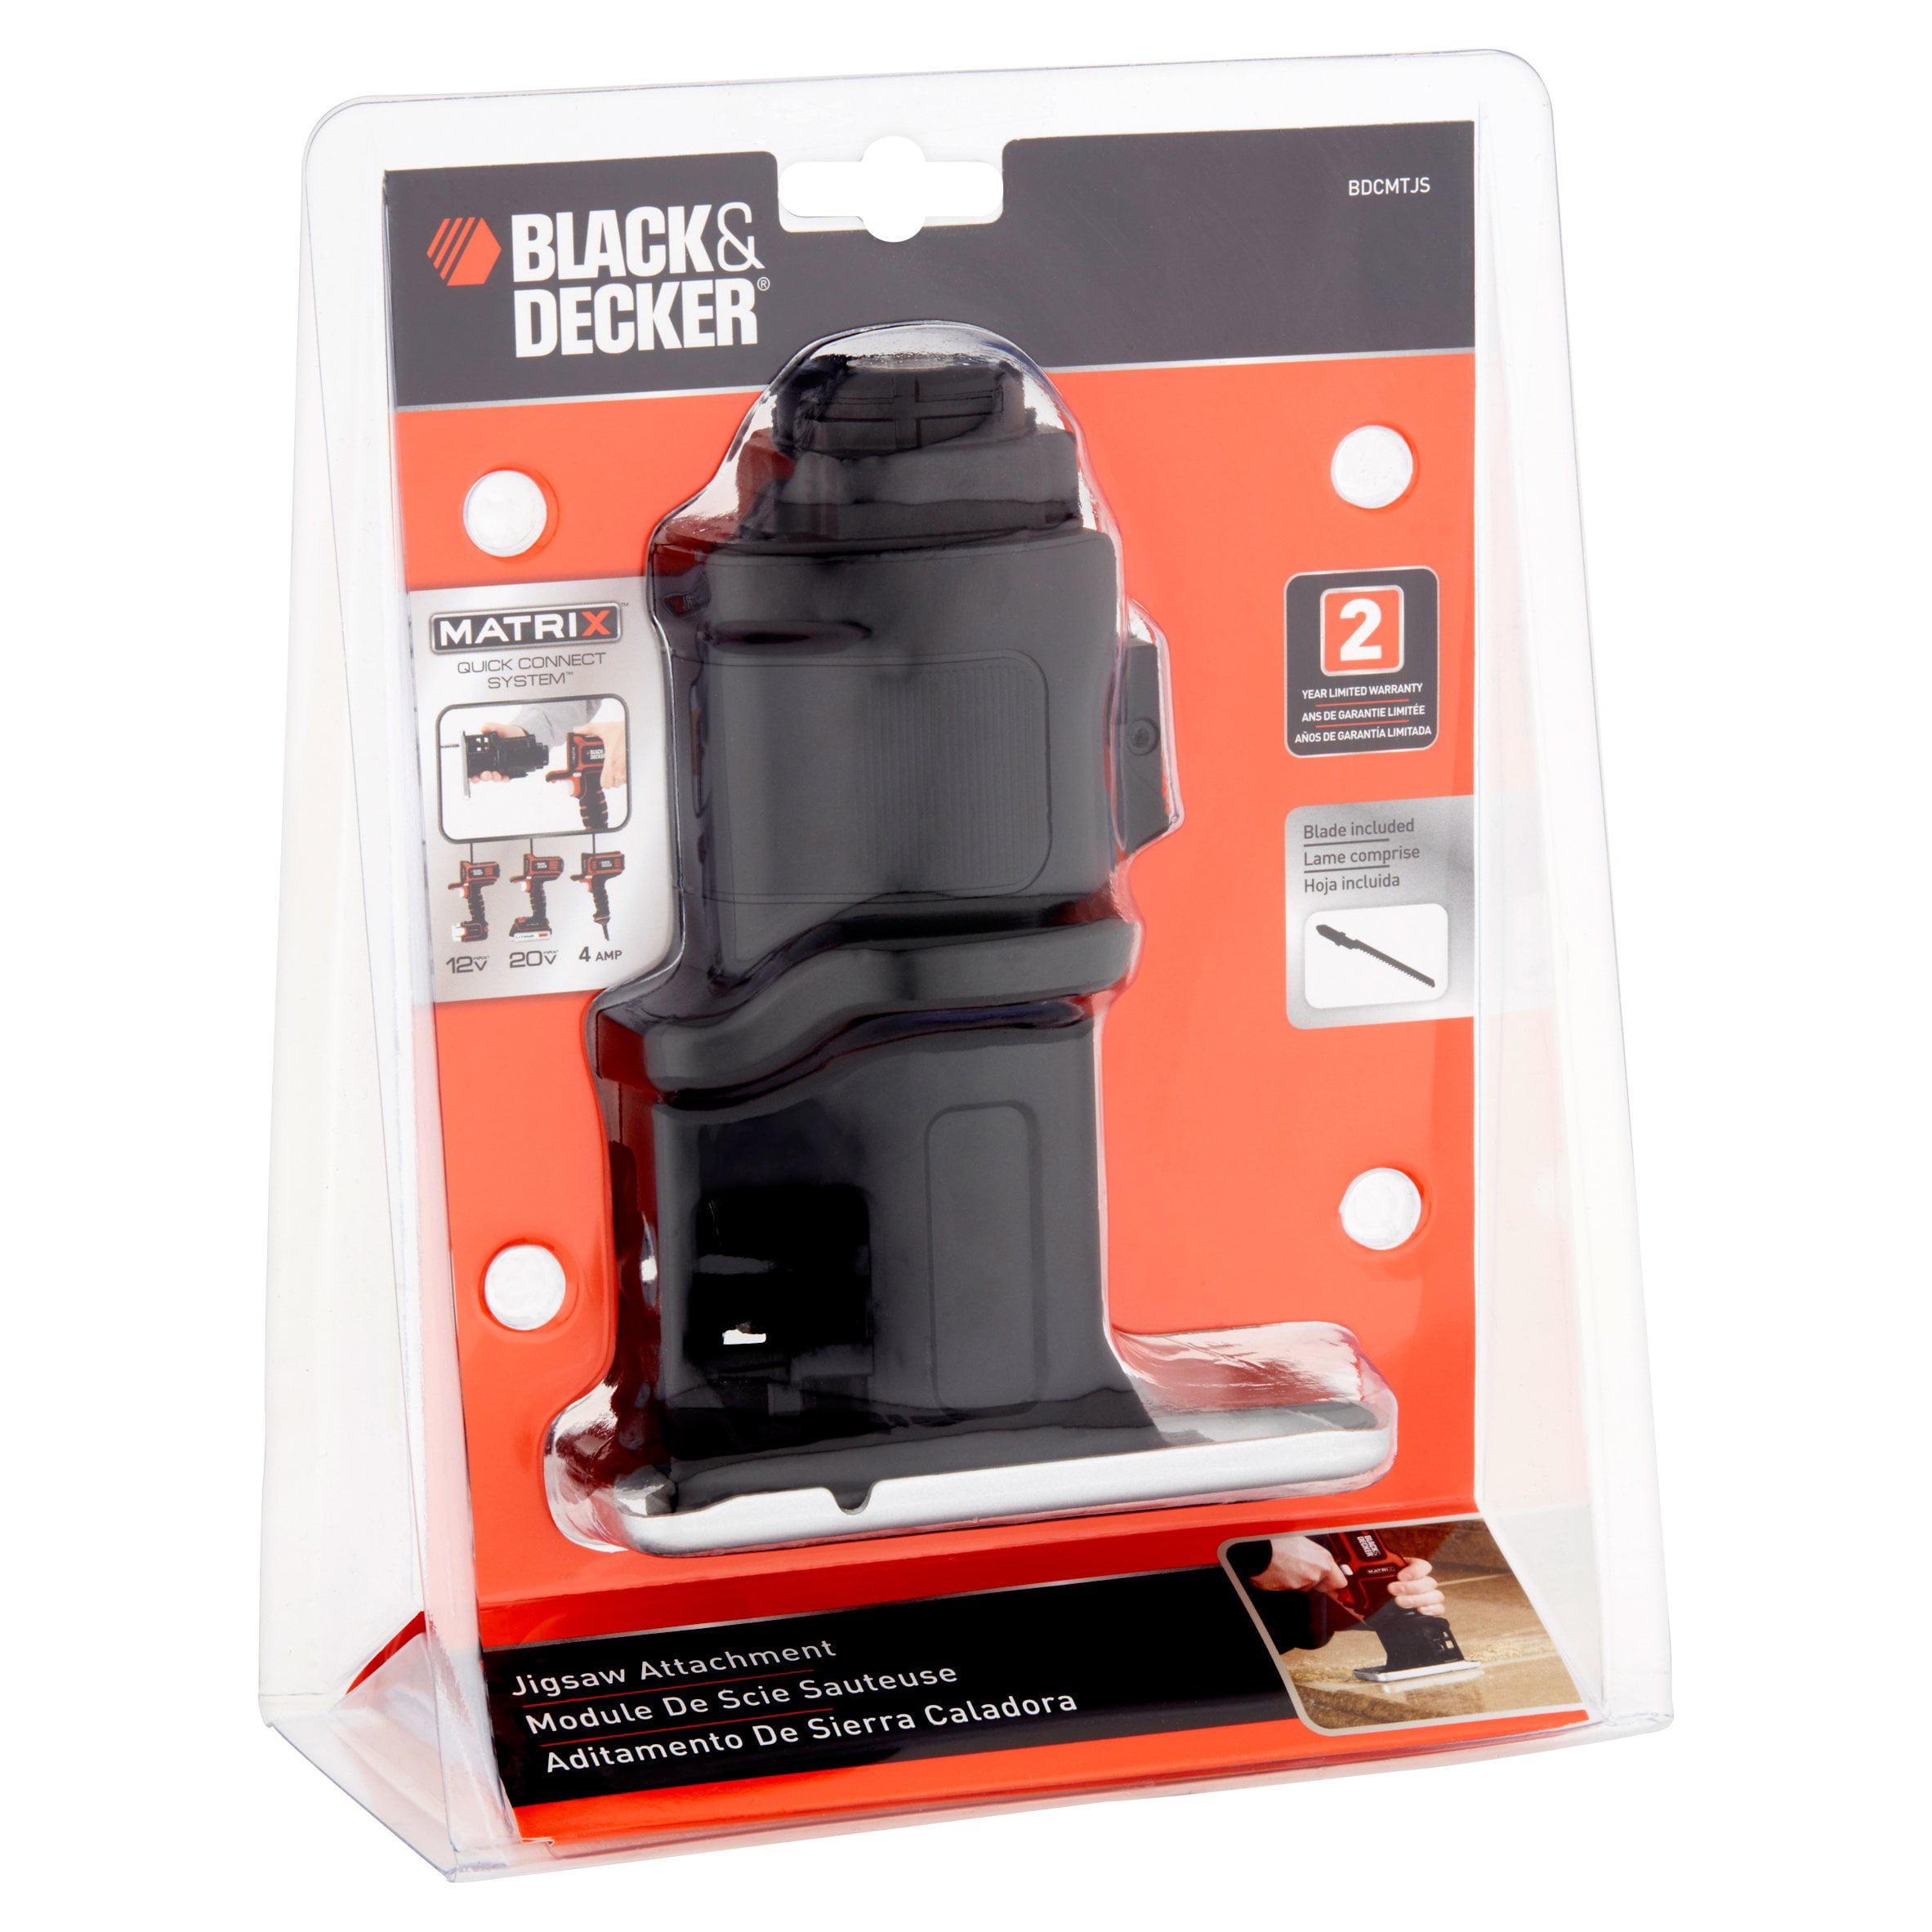 Black decker jigsaw attachment walmart greentooth Gallery